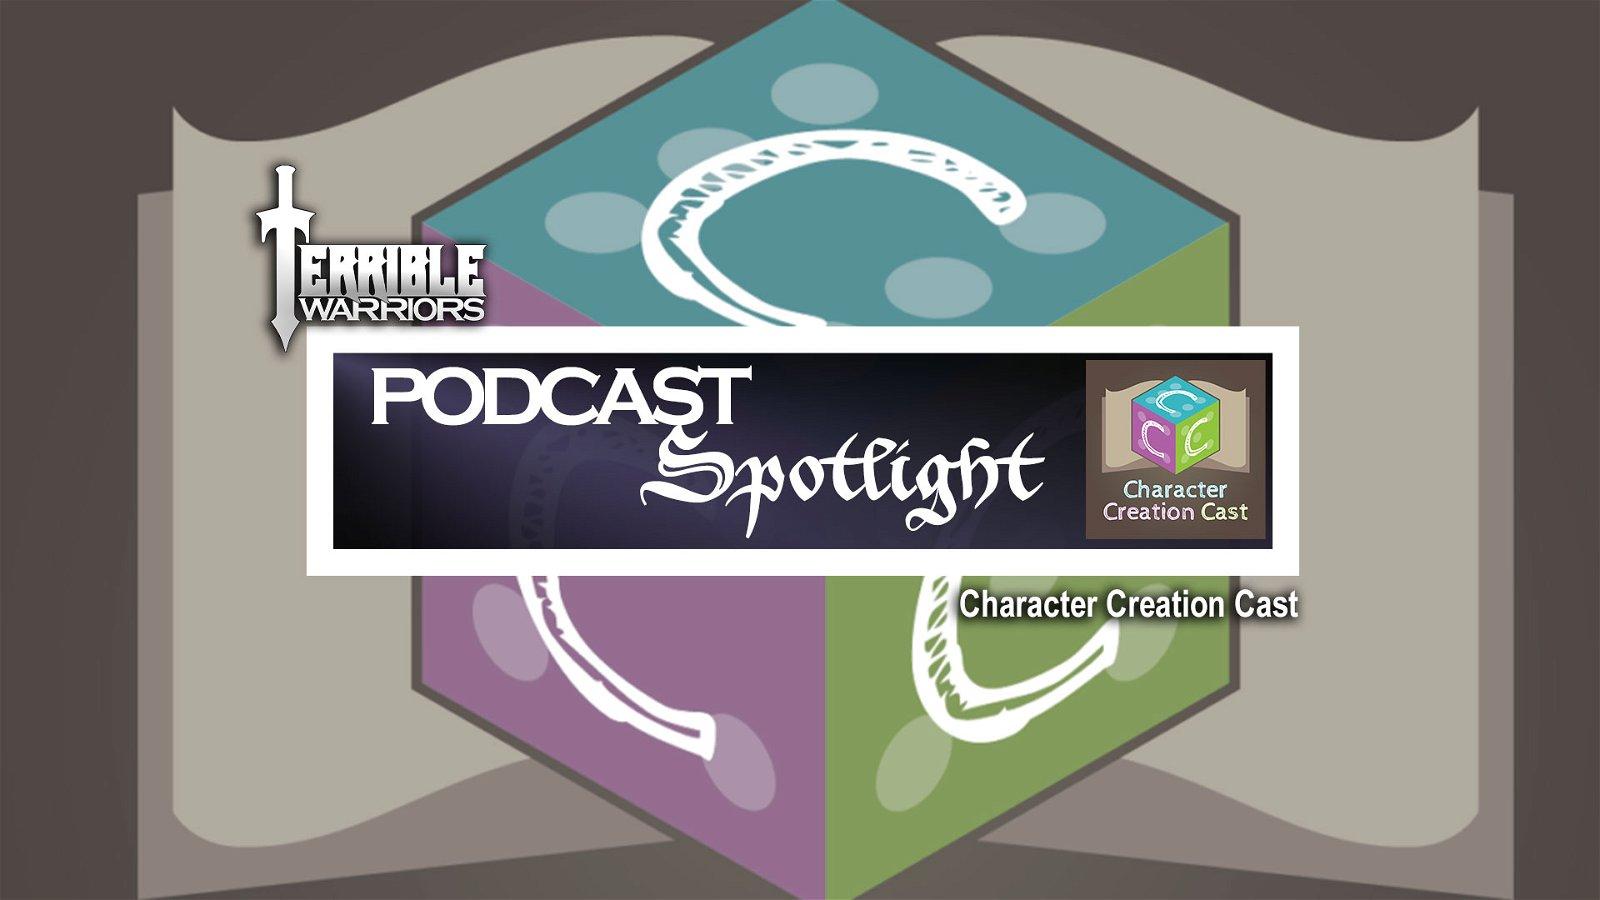 Terrible Warriors Podcast Spotlight: Character Creation Cast 1